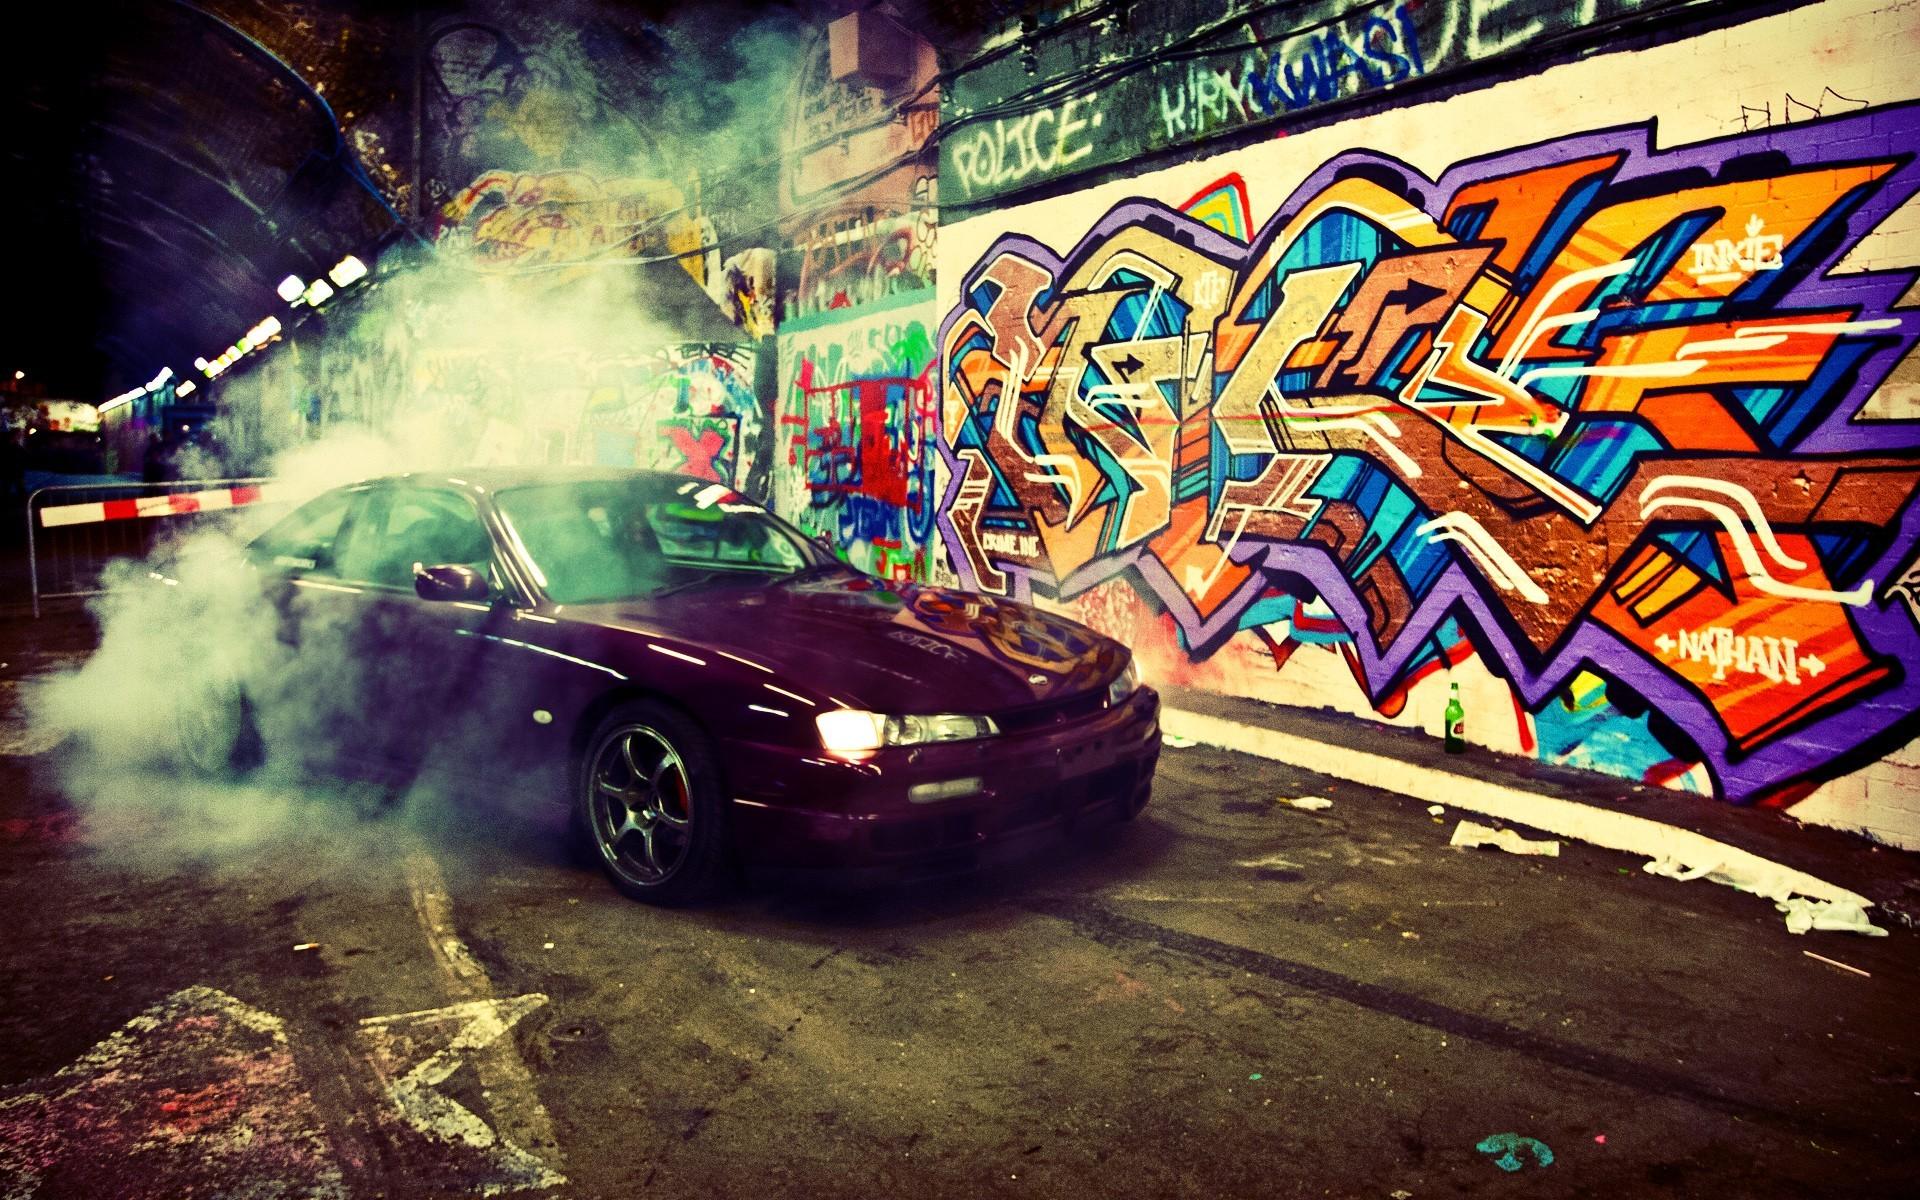 39 best UnderGround images on Pinterest | Image, Graffiti art and Urban art